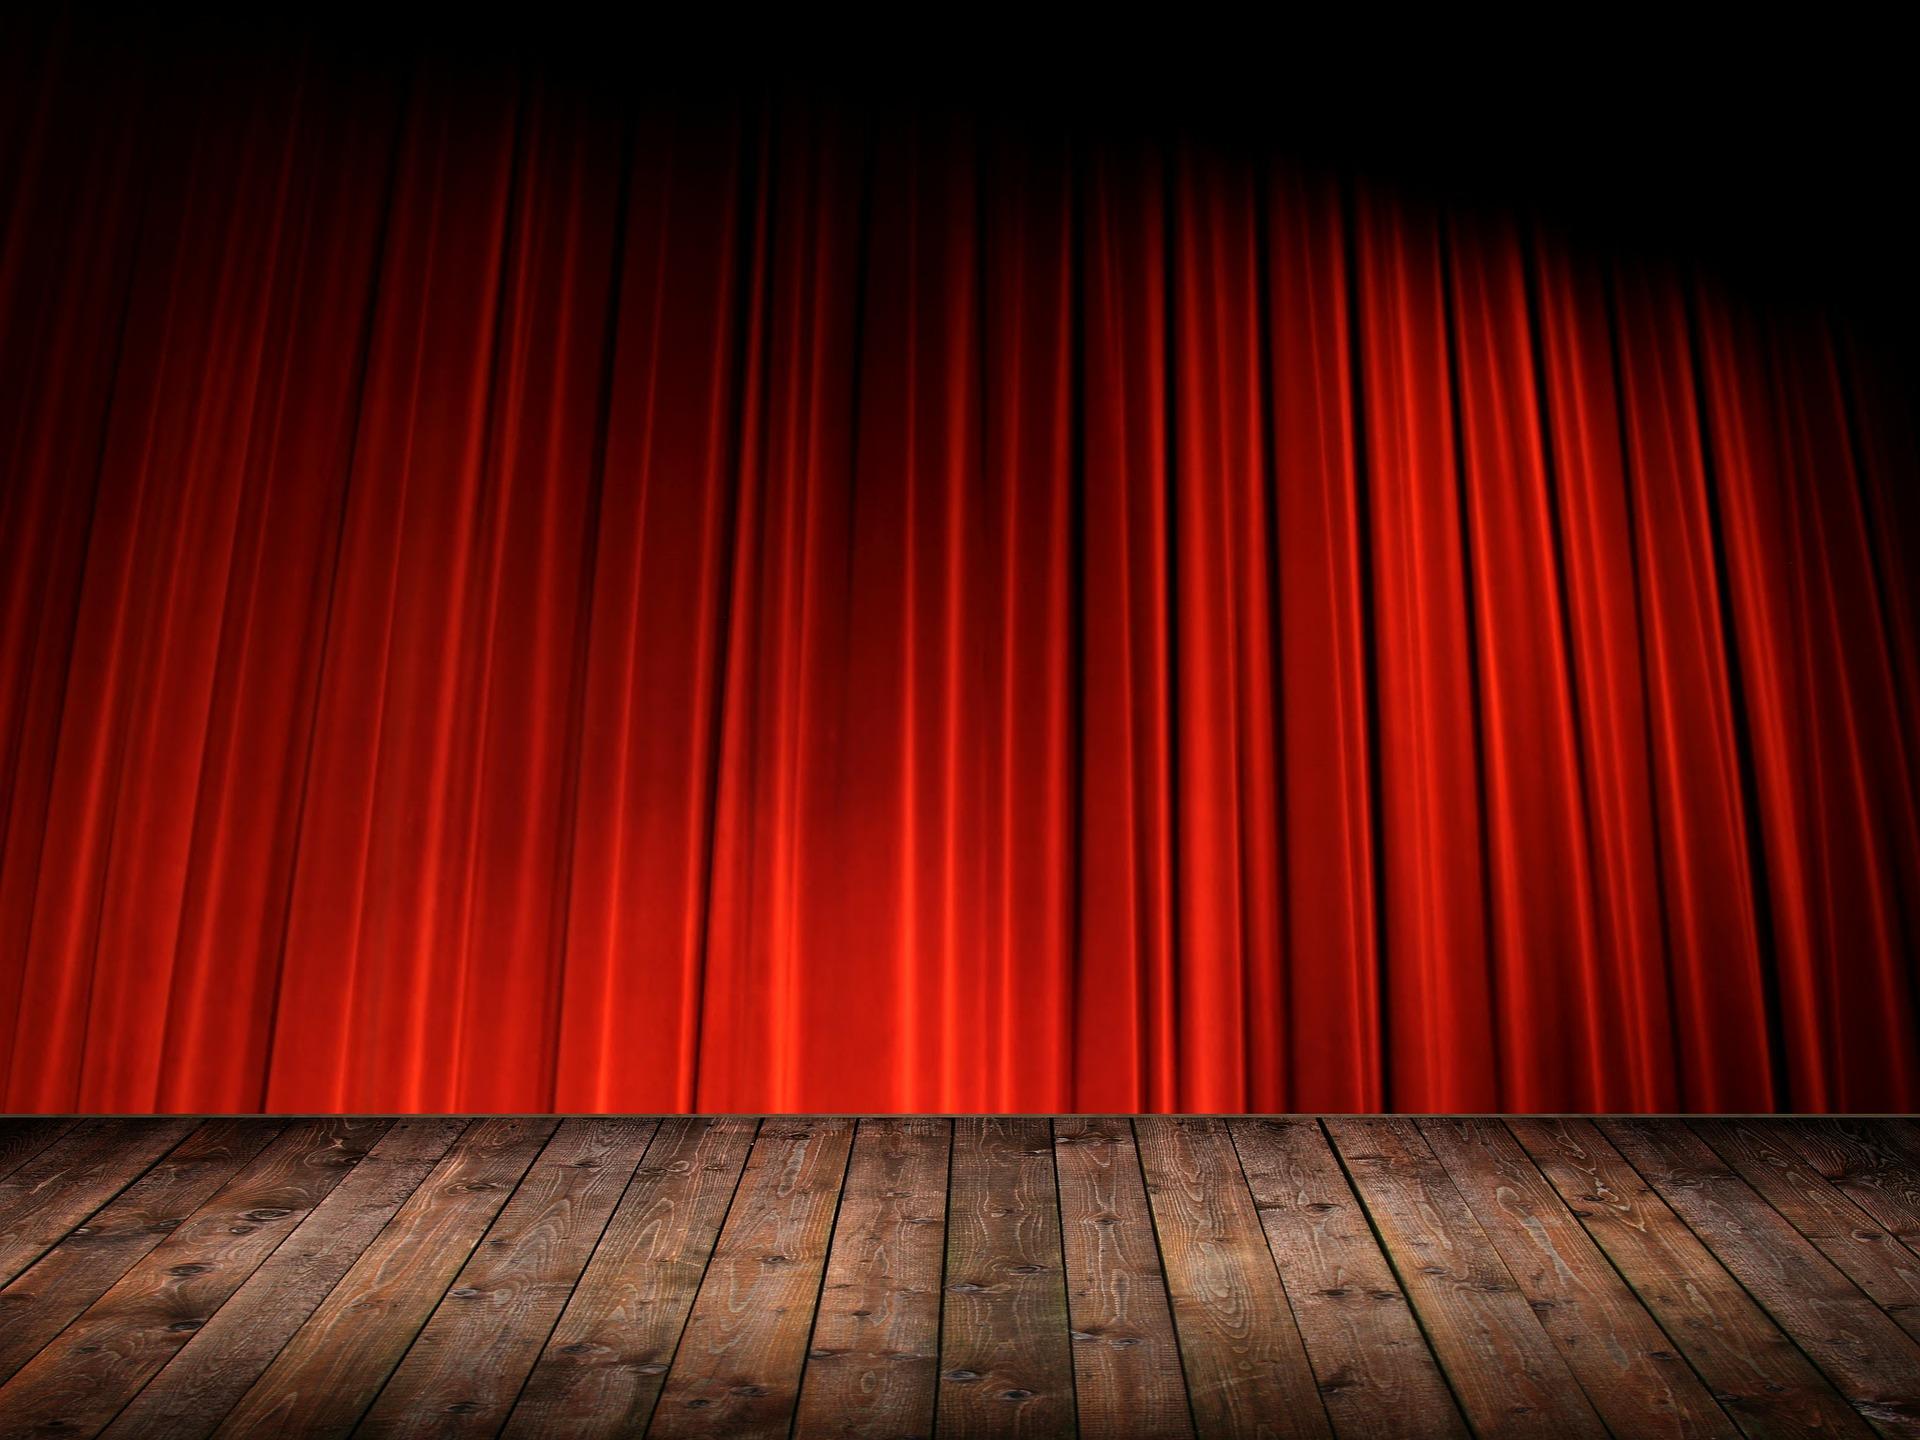 curtain-269920_1920.jpg